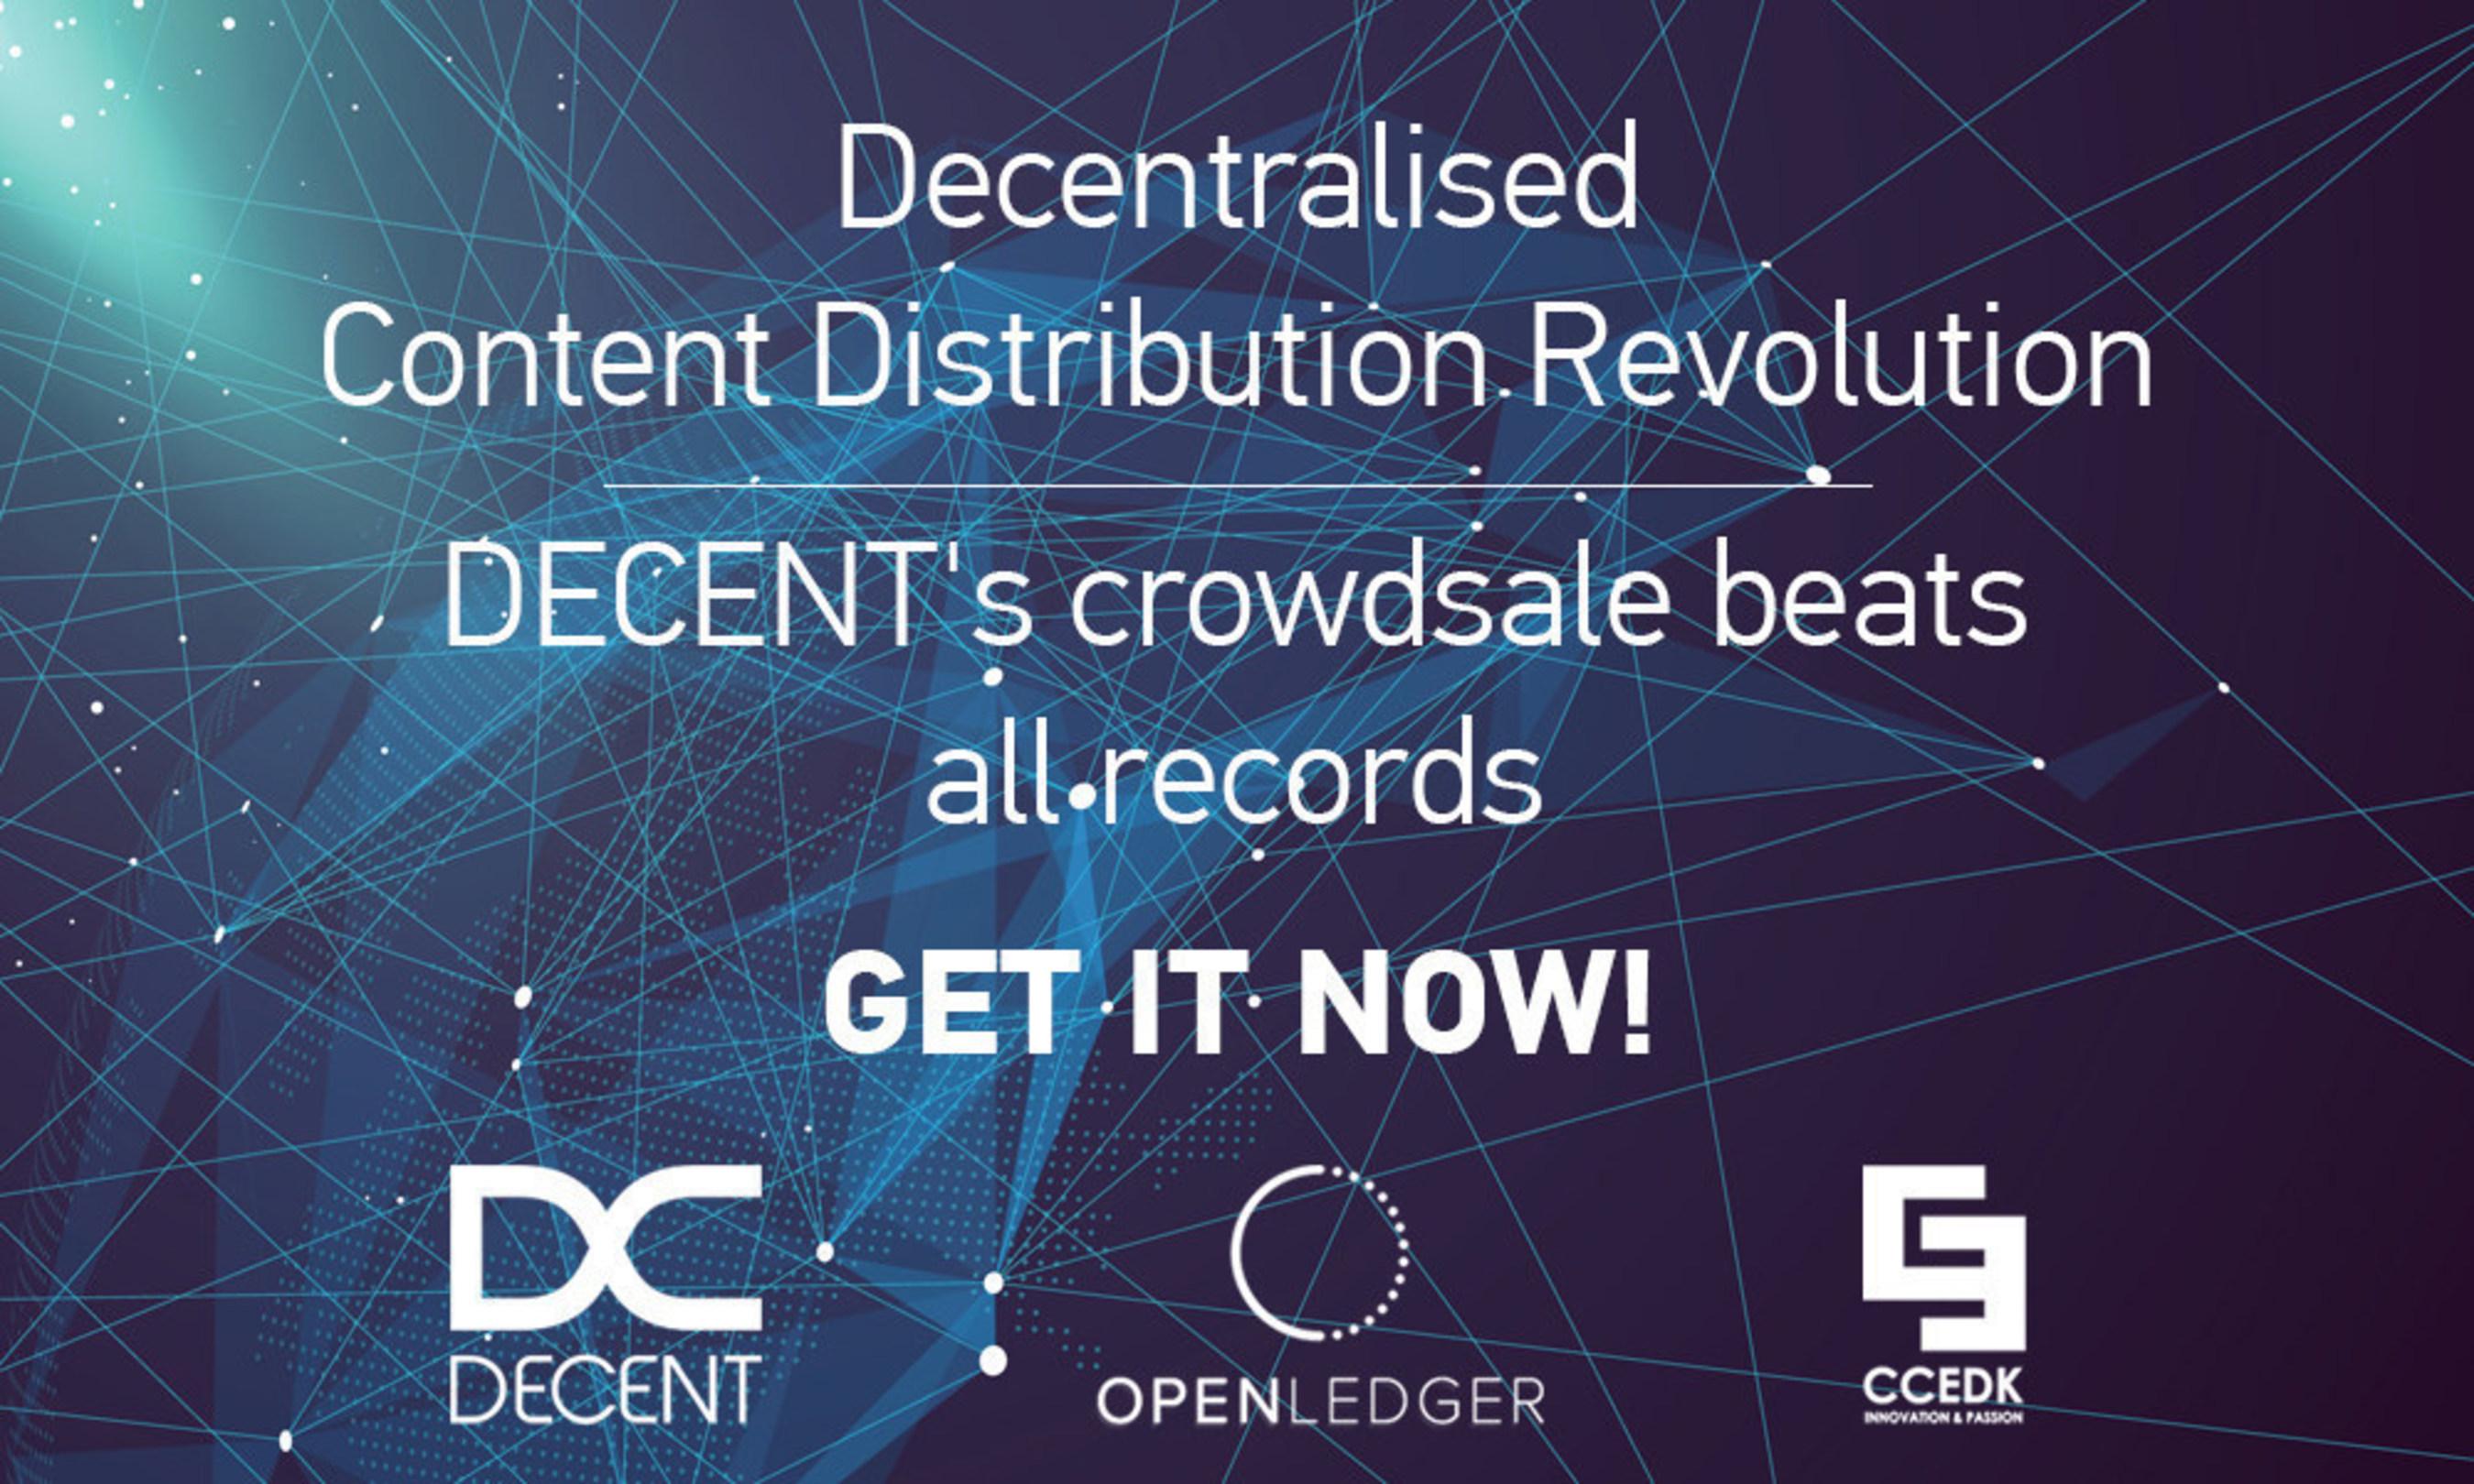 DECENT Blockchain Platform ICO Raises Over 4138 BTC in Two Days